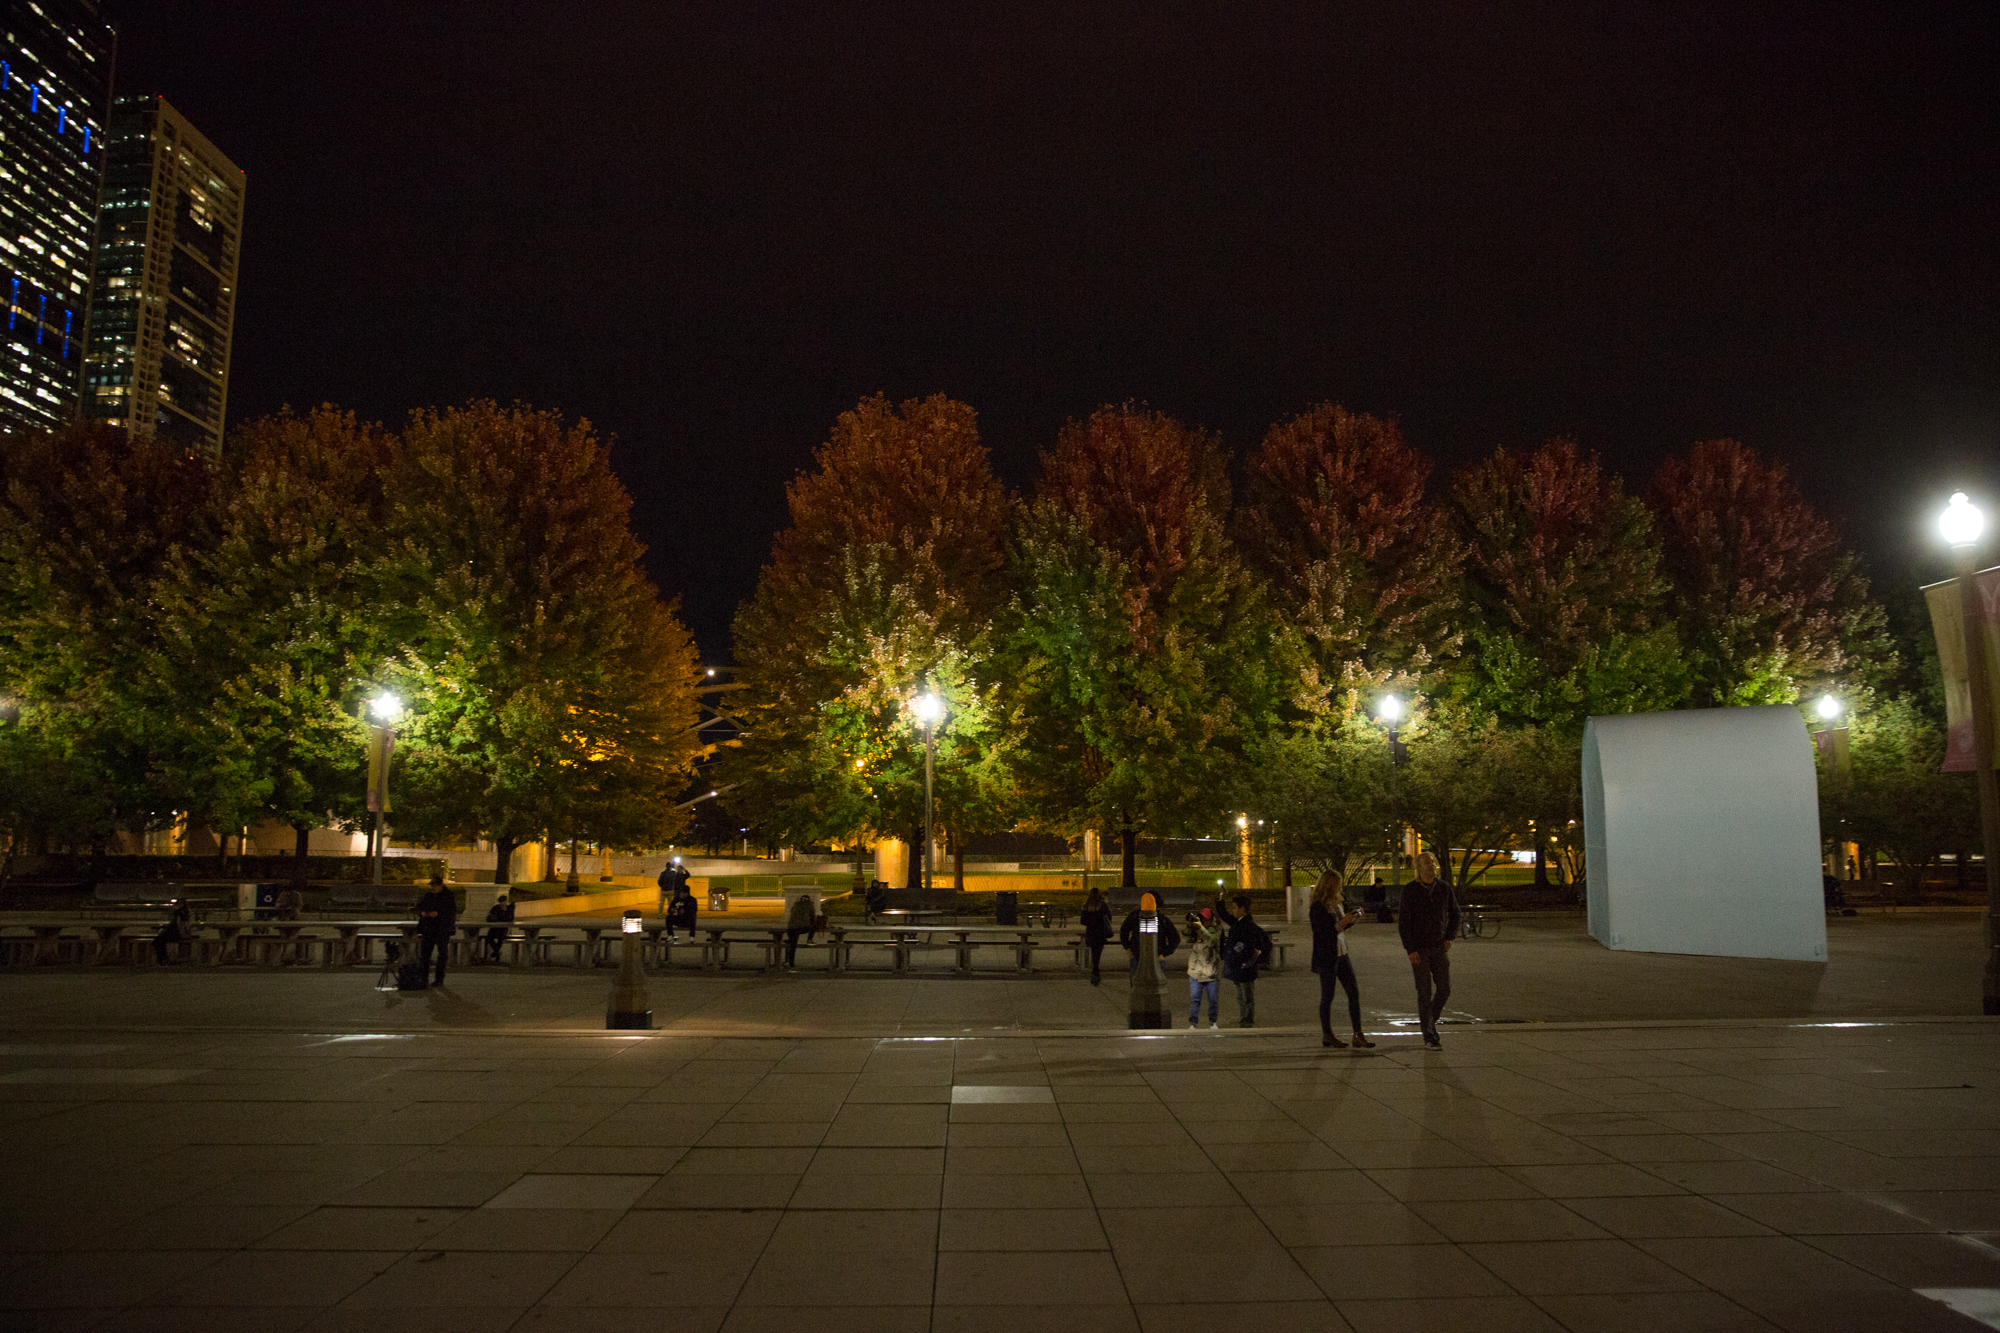 chicago-at-night-blog-116